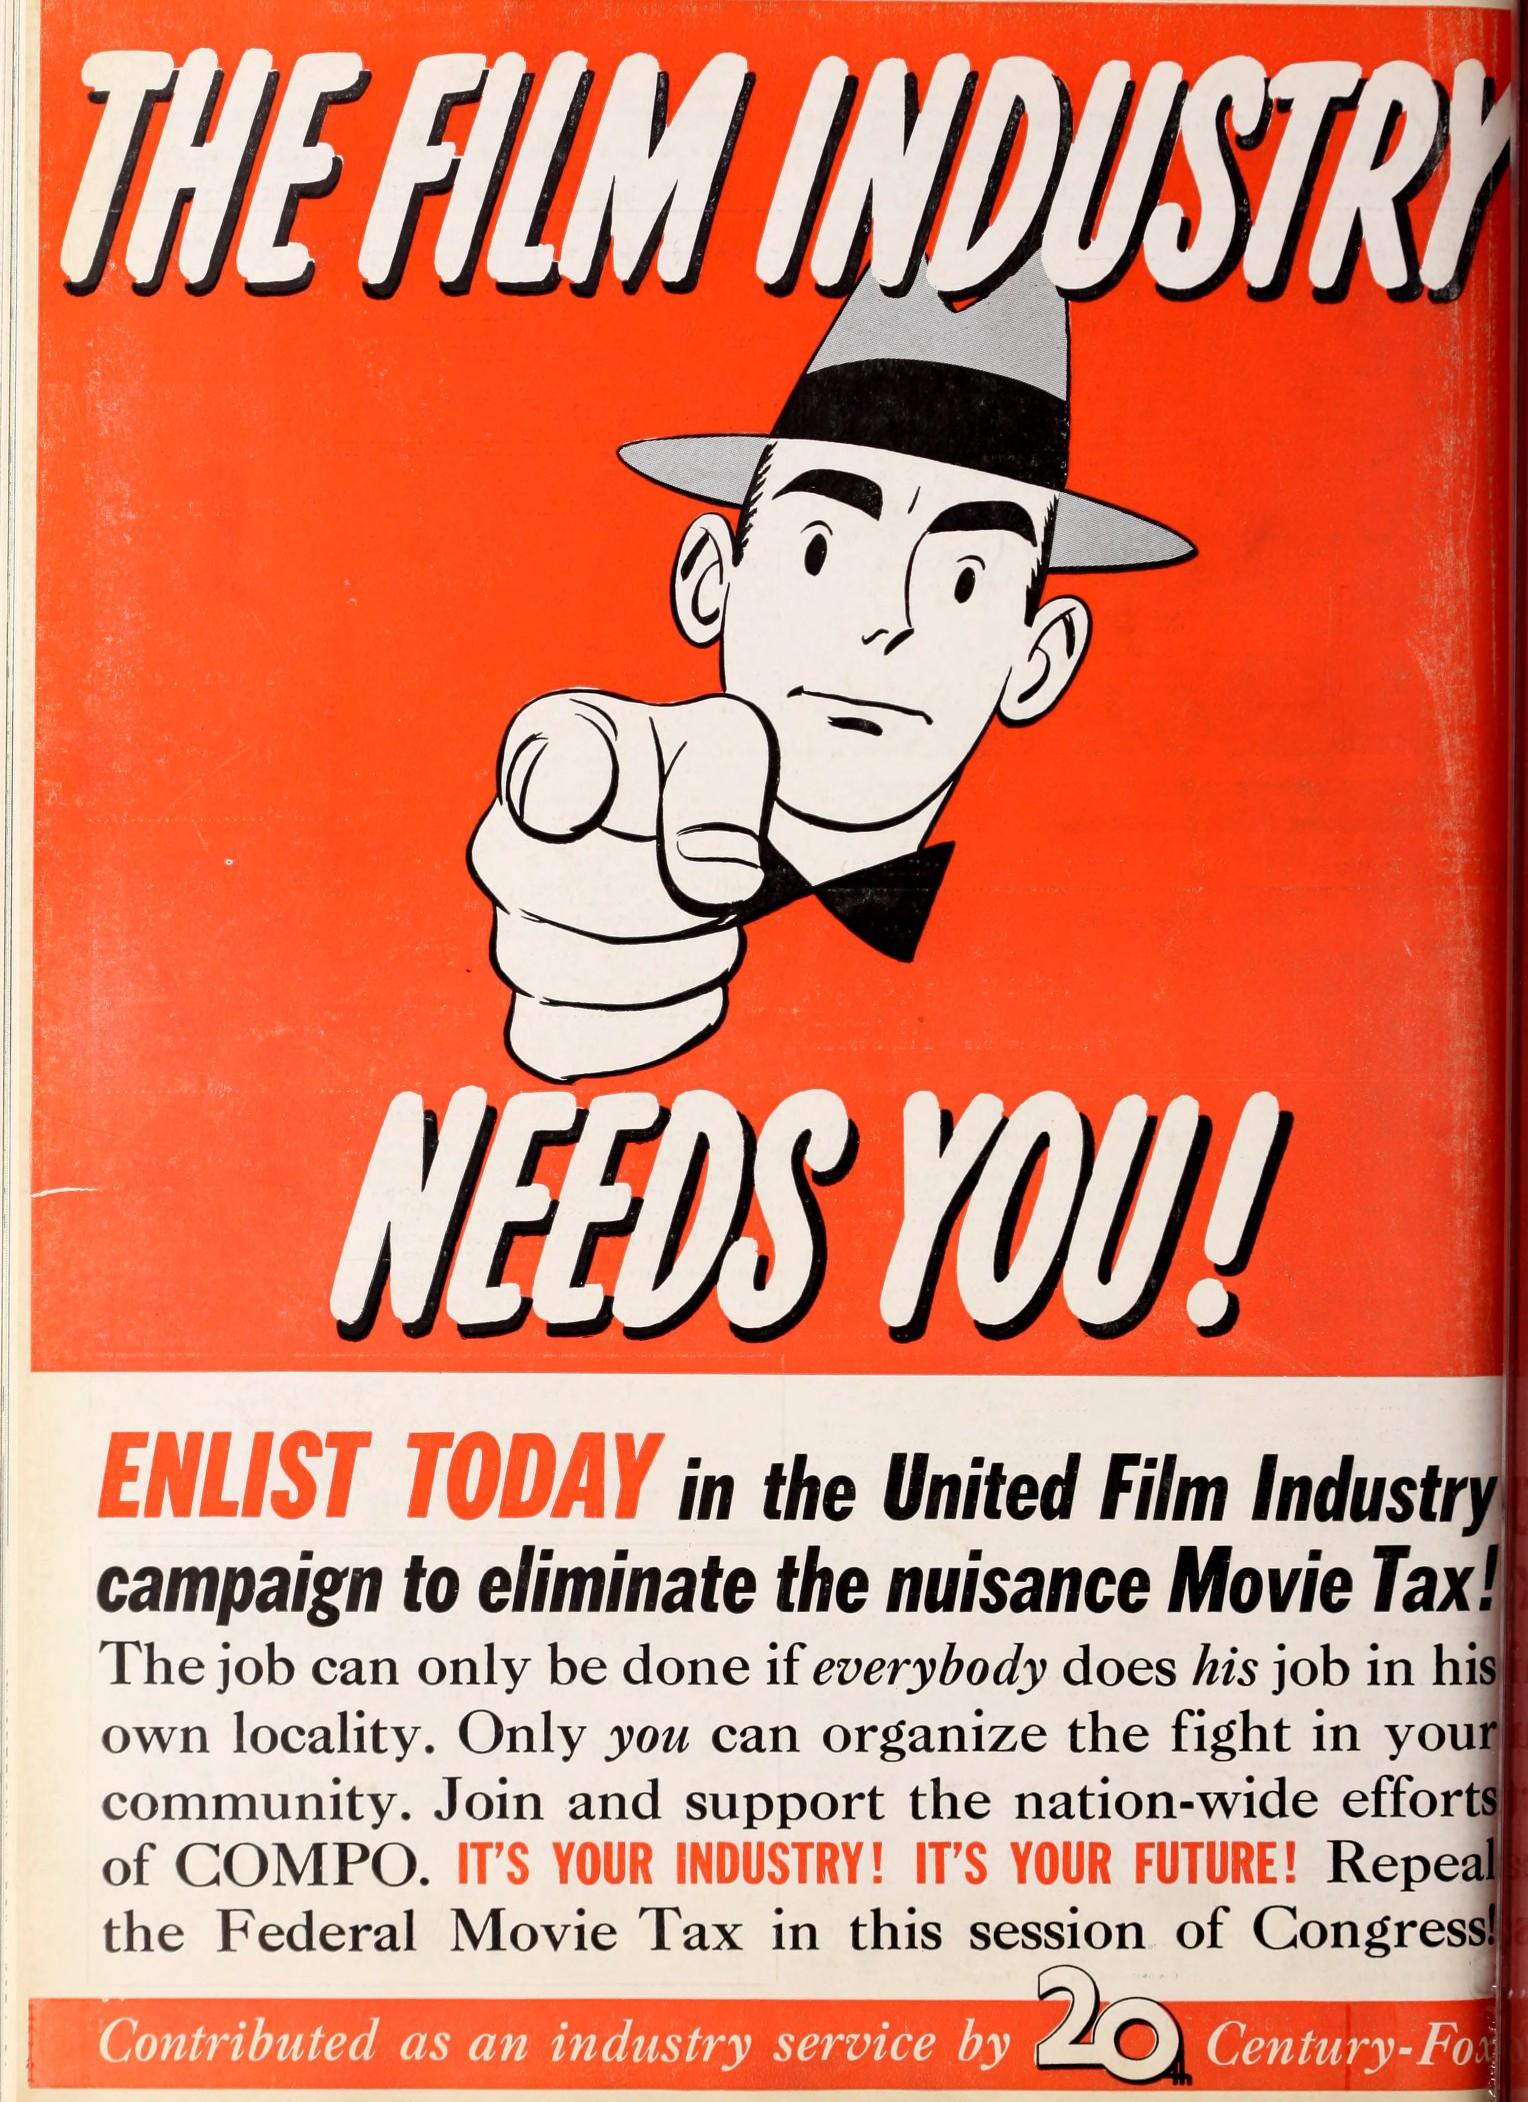 Filmbulletin195018film_jp2.zip&file=filmbulletin195018film_jp2%2ffilmbulletin195018film_0128